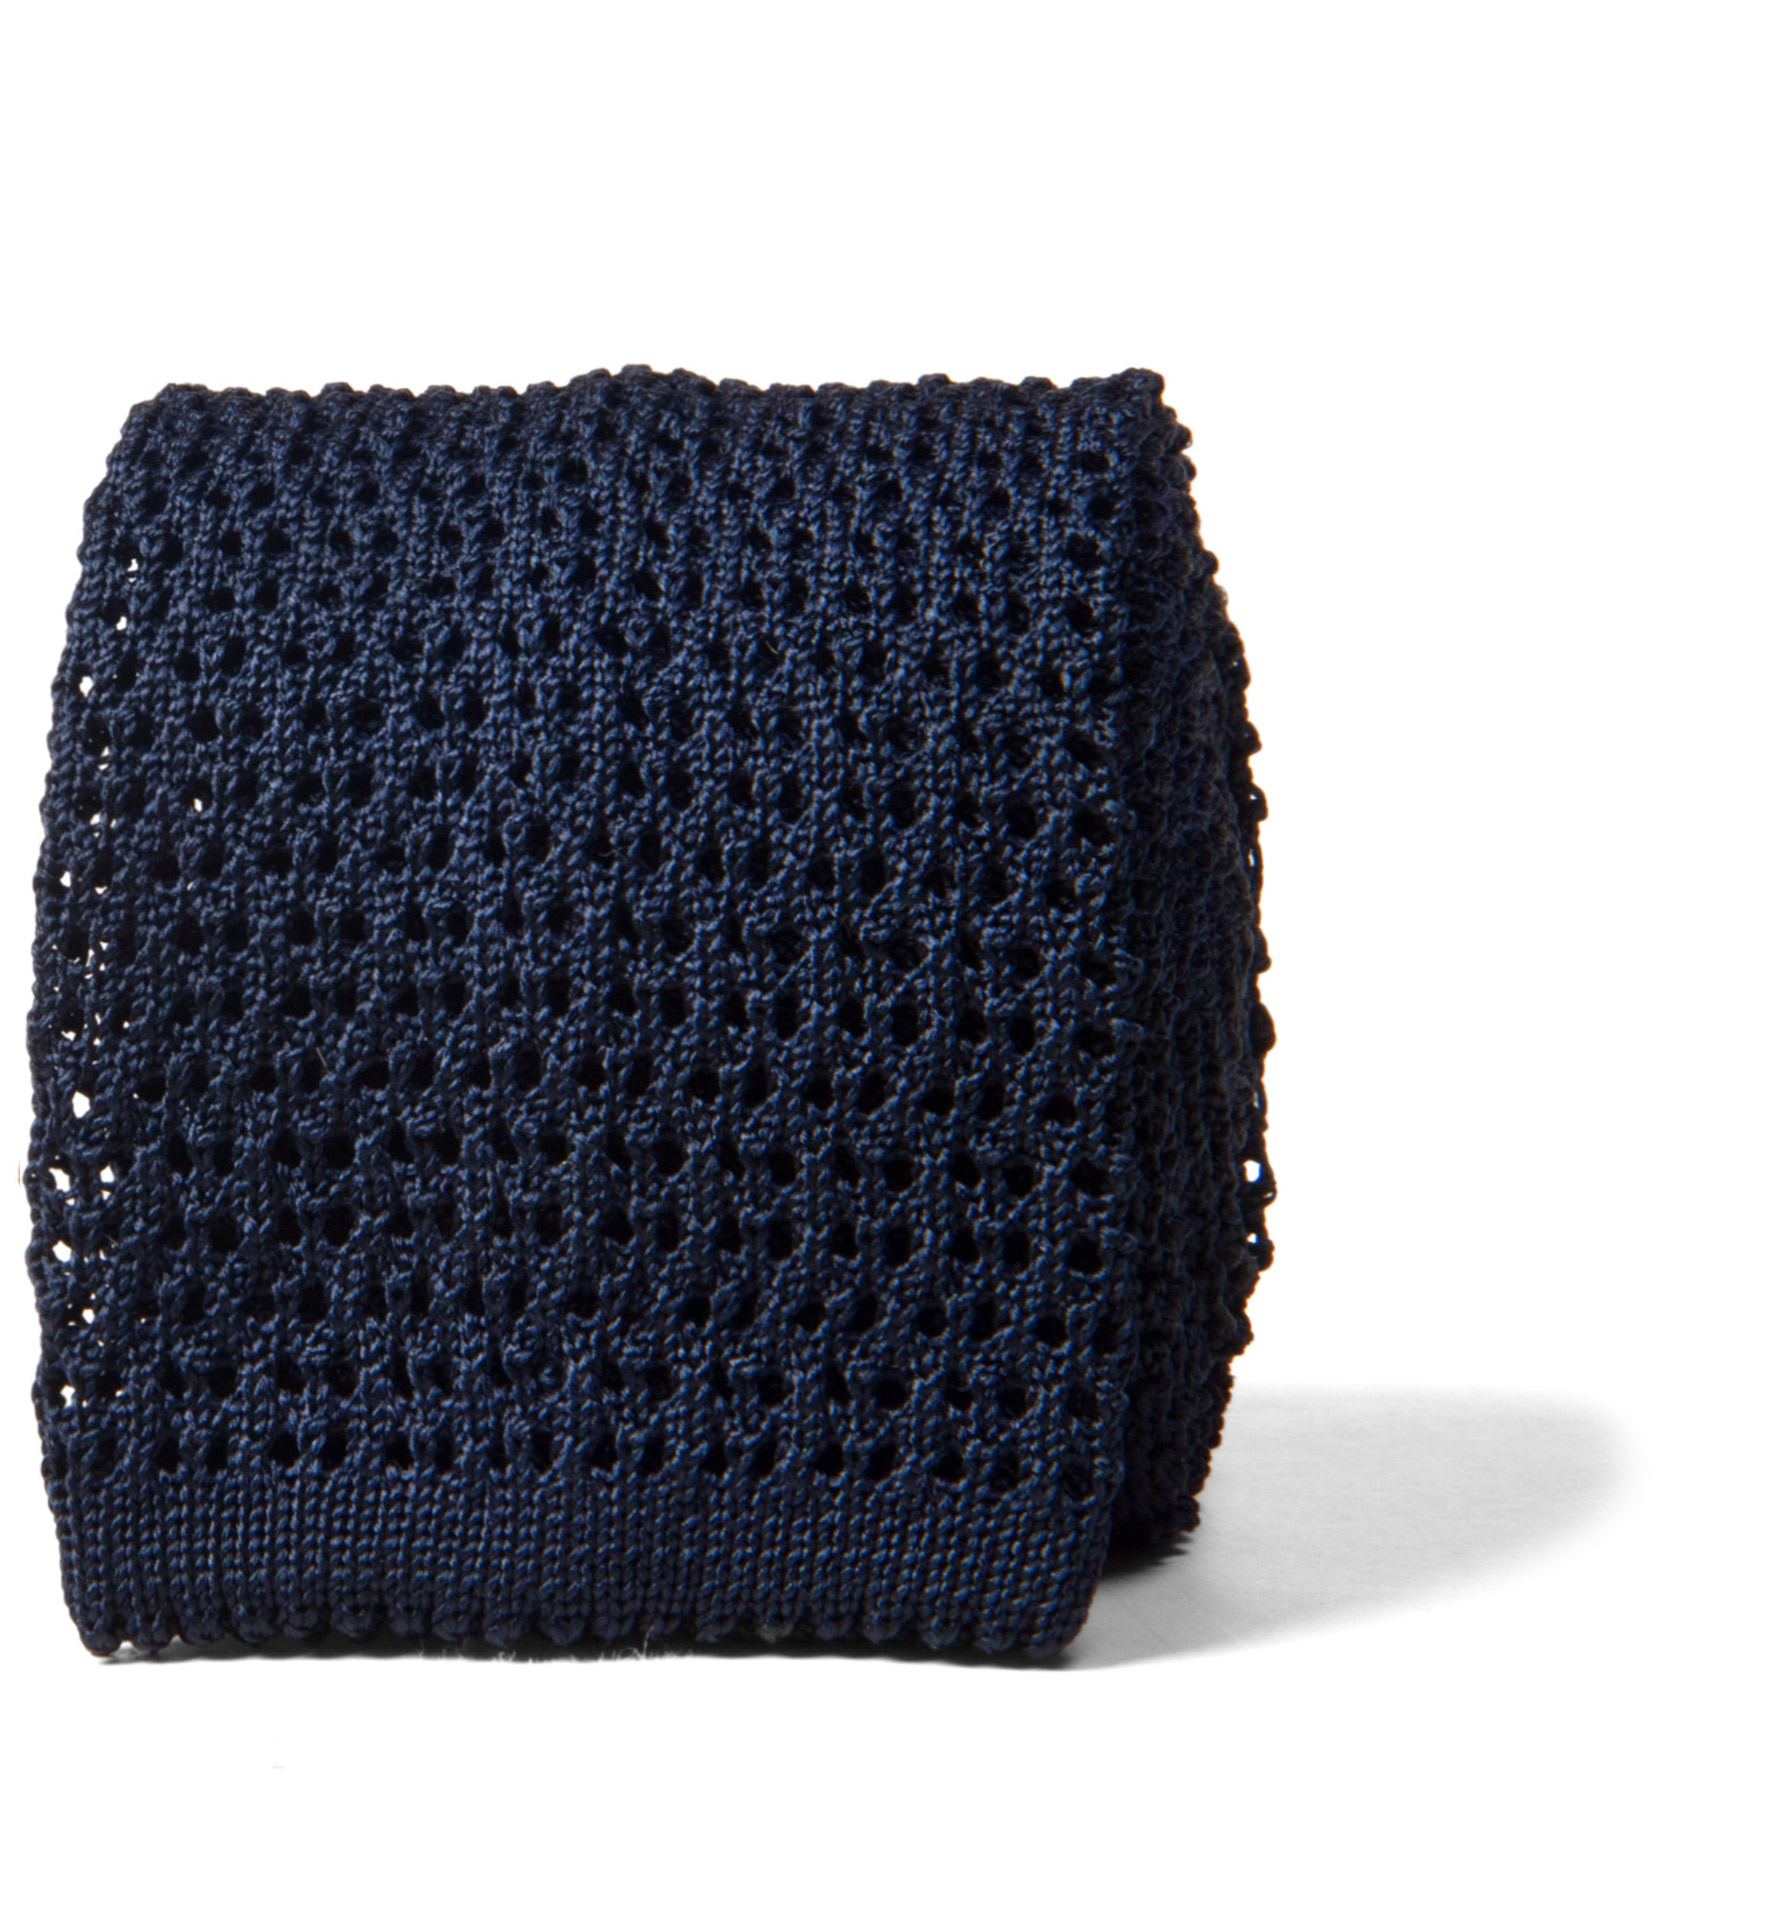 Zoom Image of Navy Silk Knit Tie